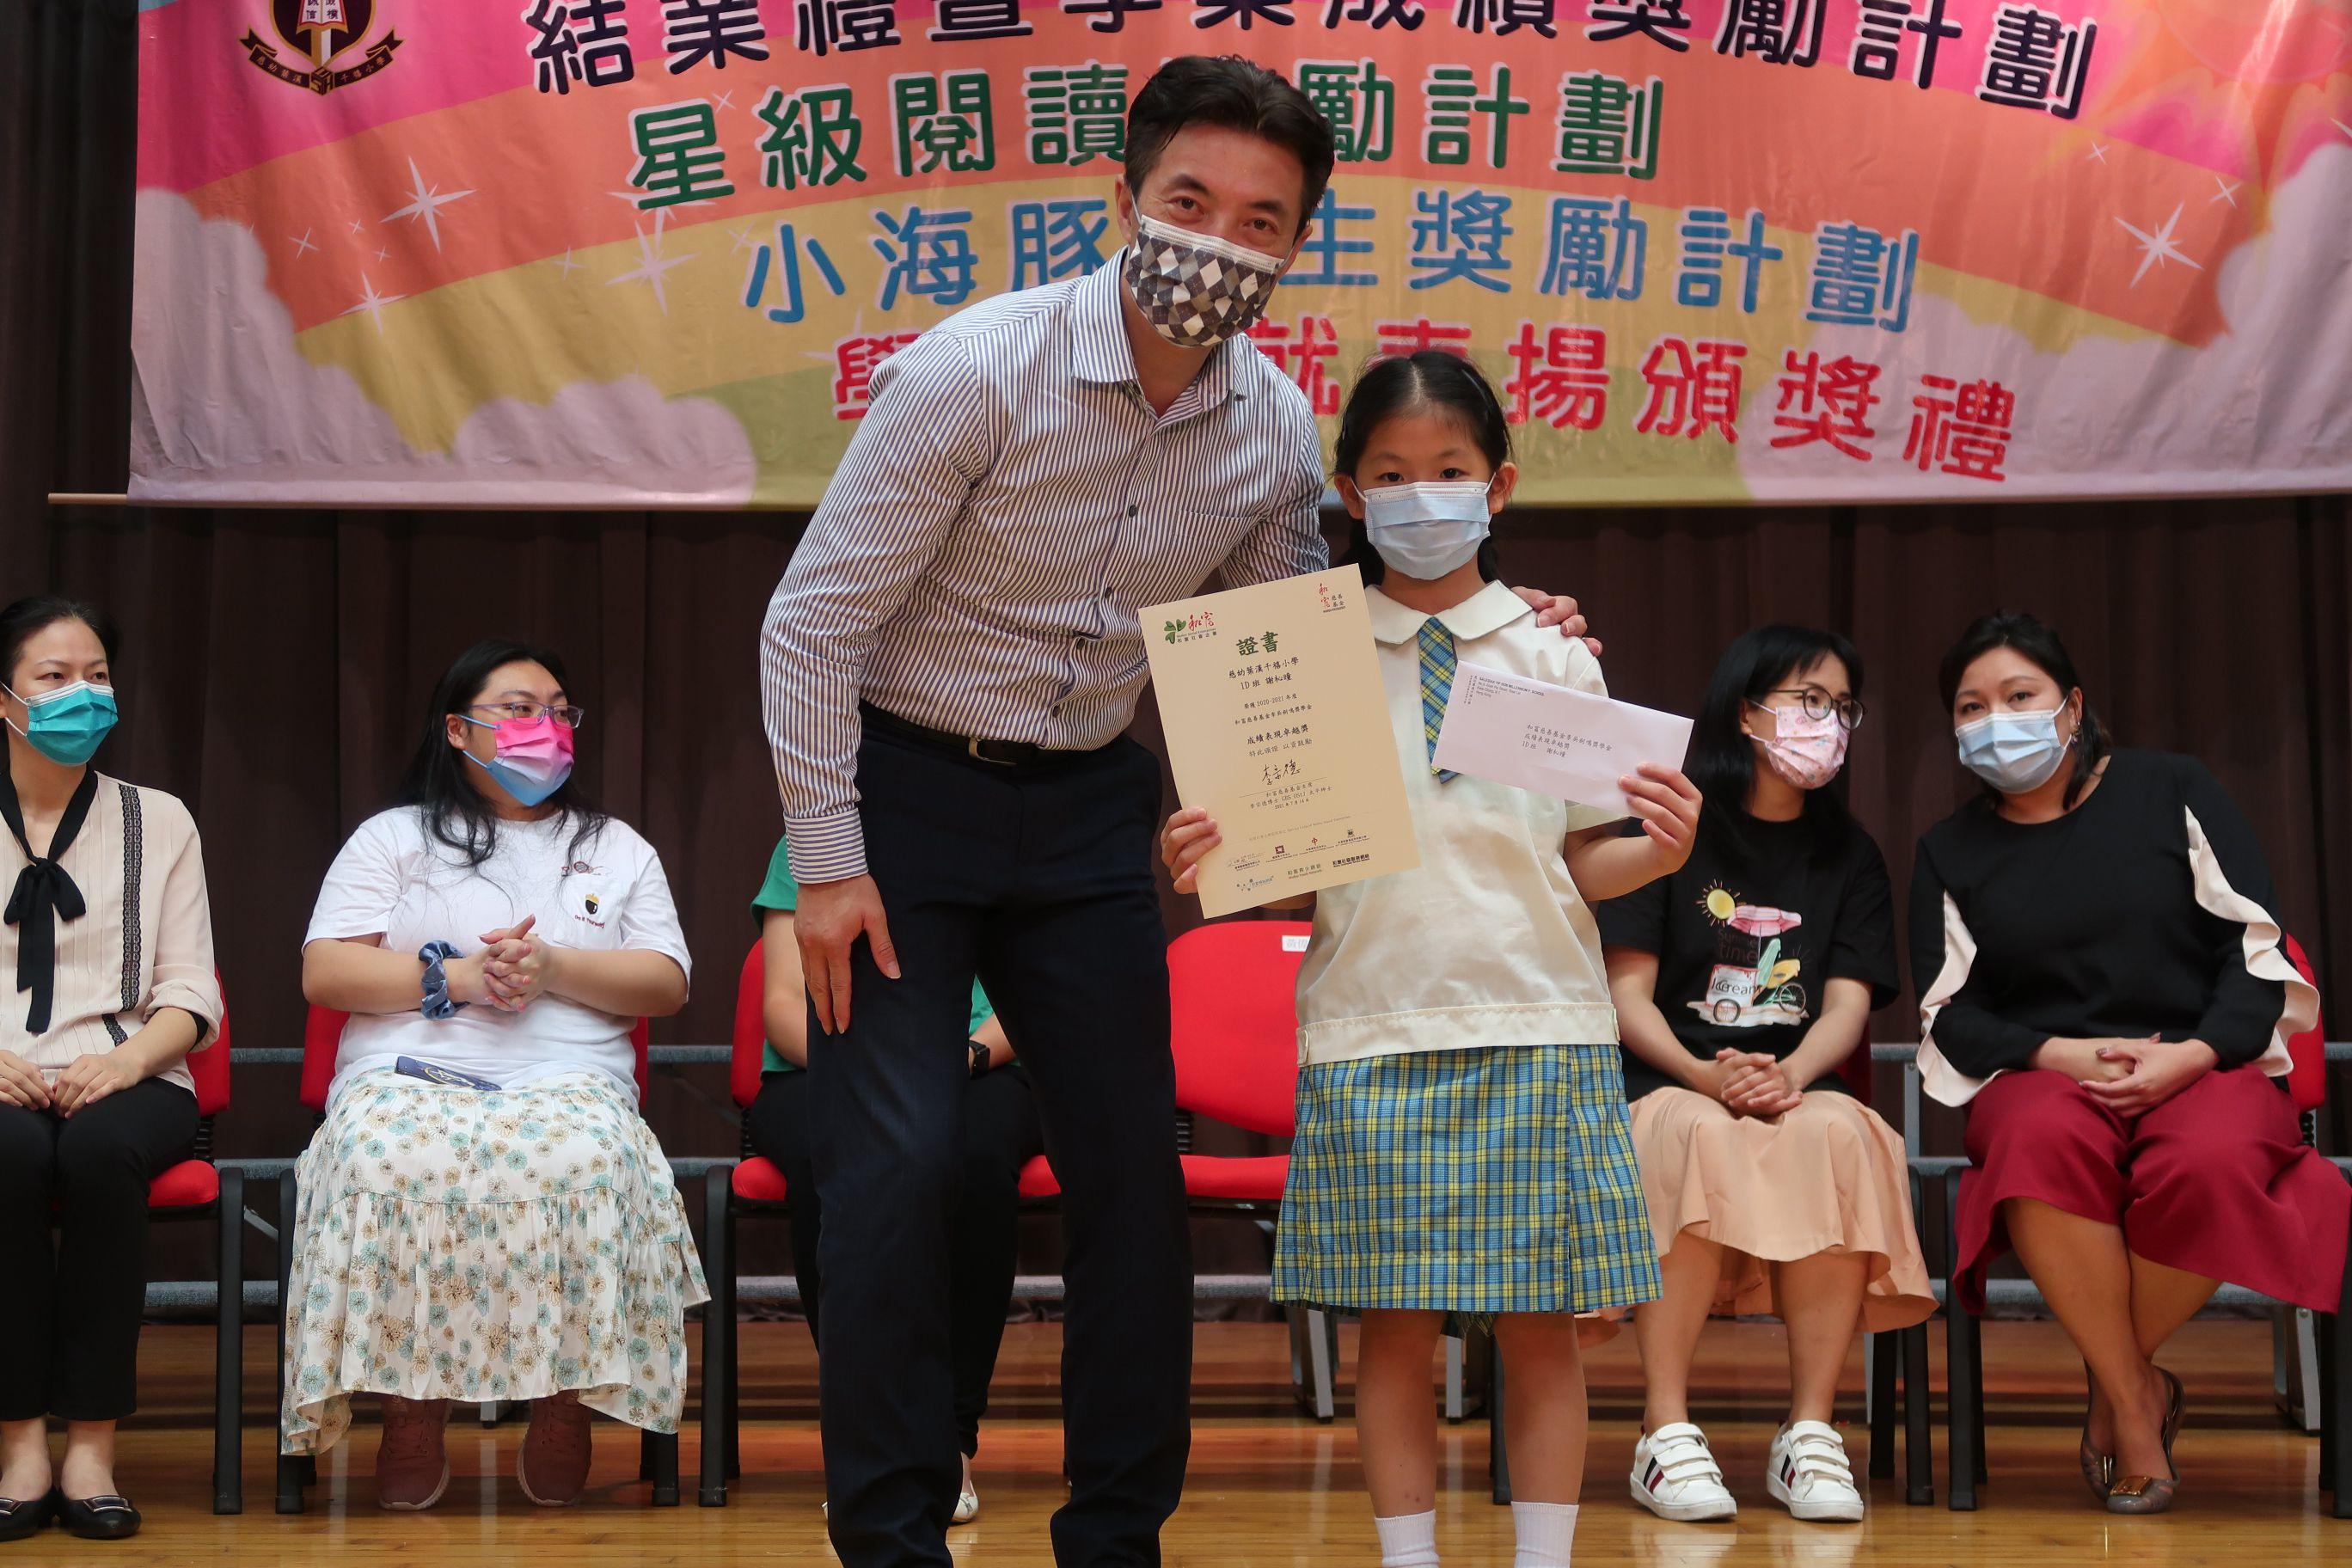 https://syh.edu.hk/sites/default/files/img_5927.jpg